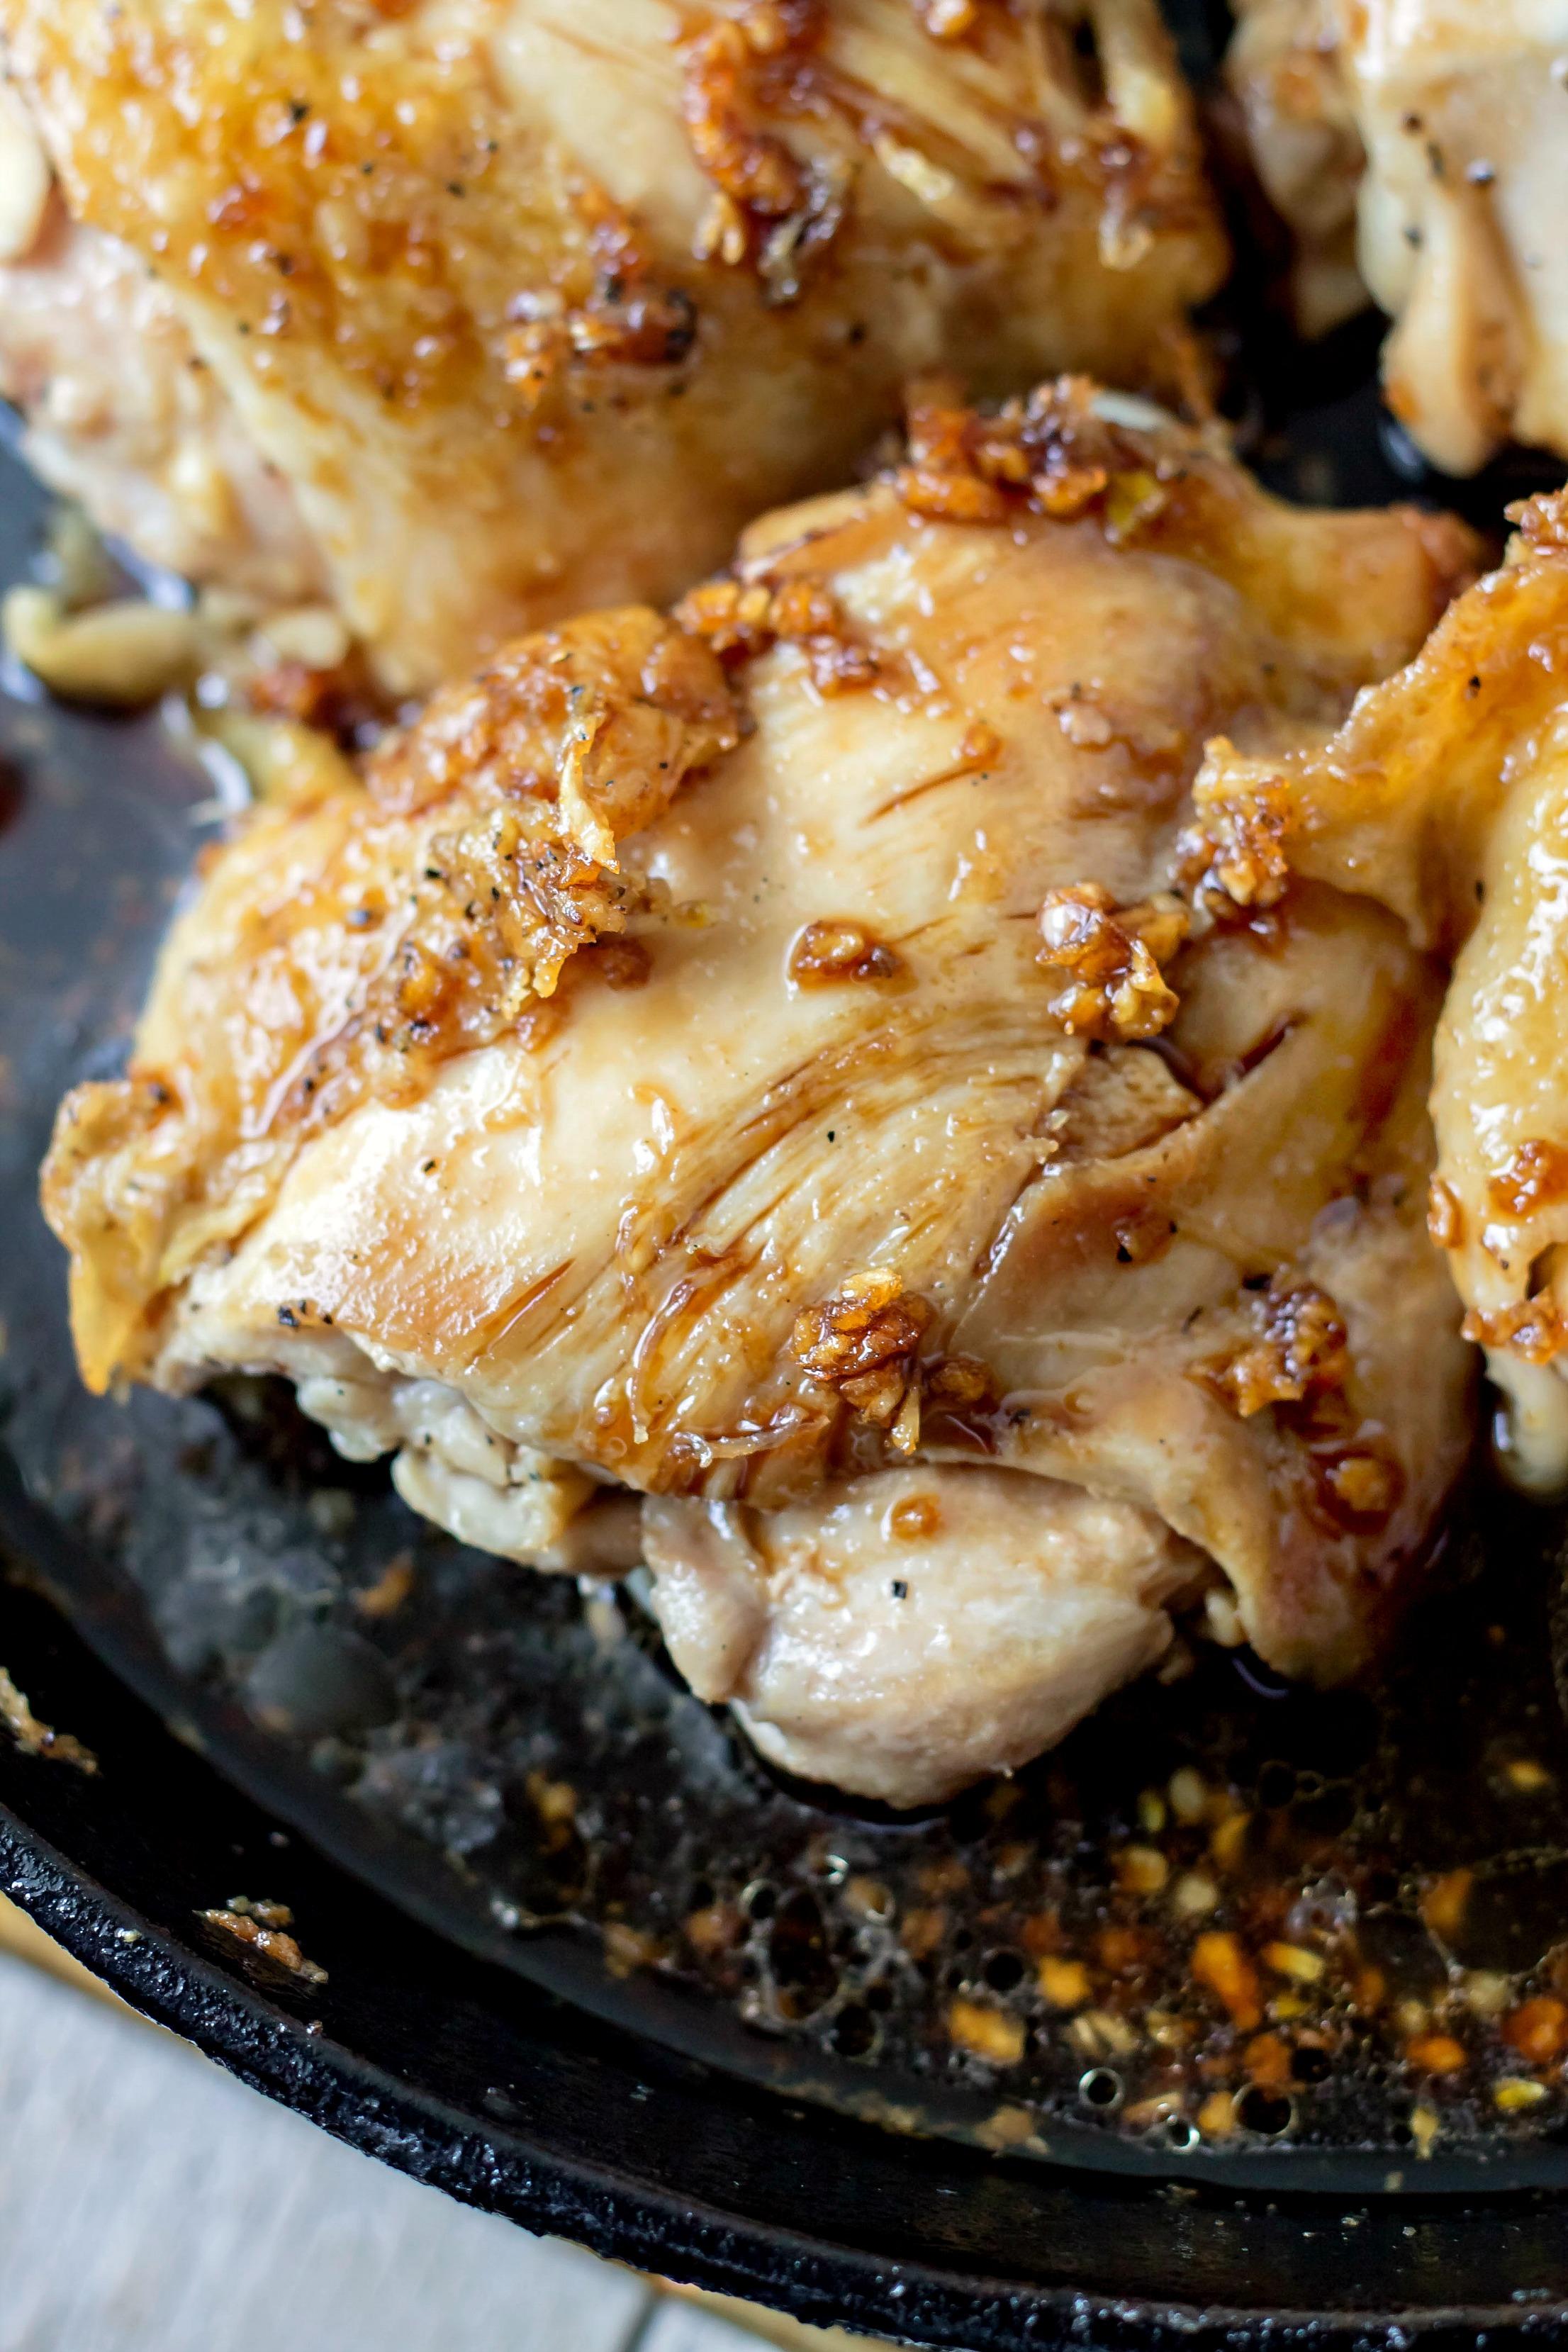 Glazed Soy Sauce Brown Sugar Chicken Thighs